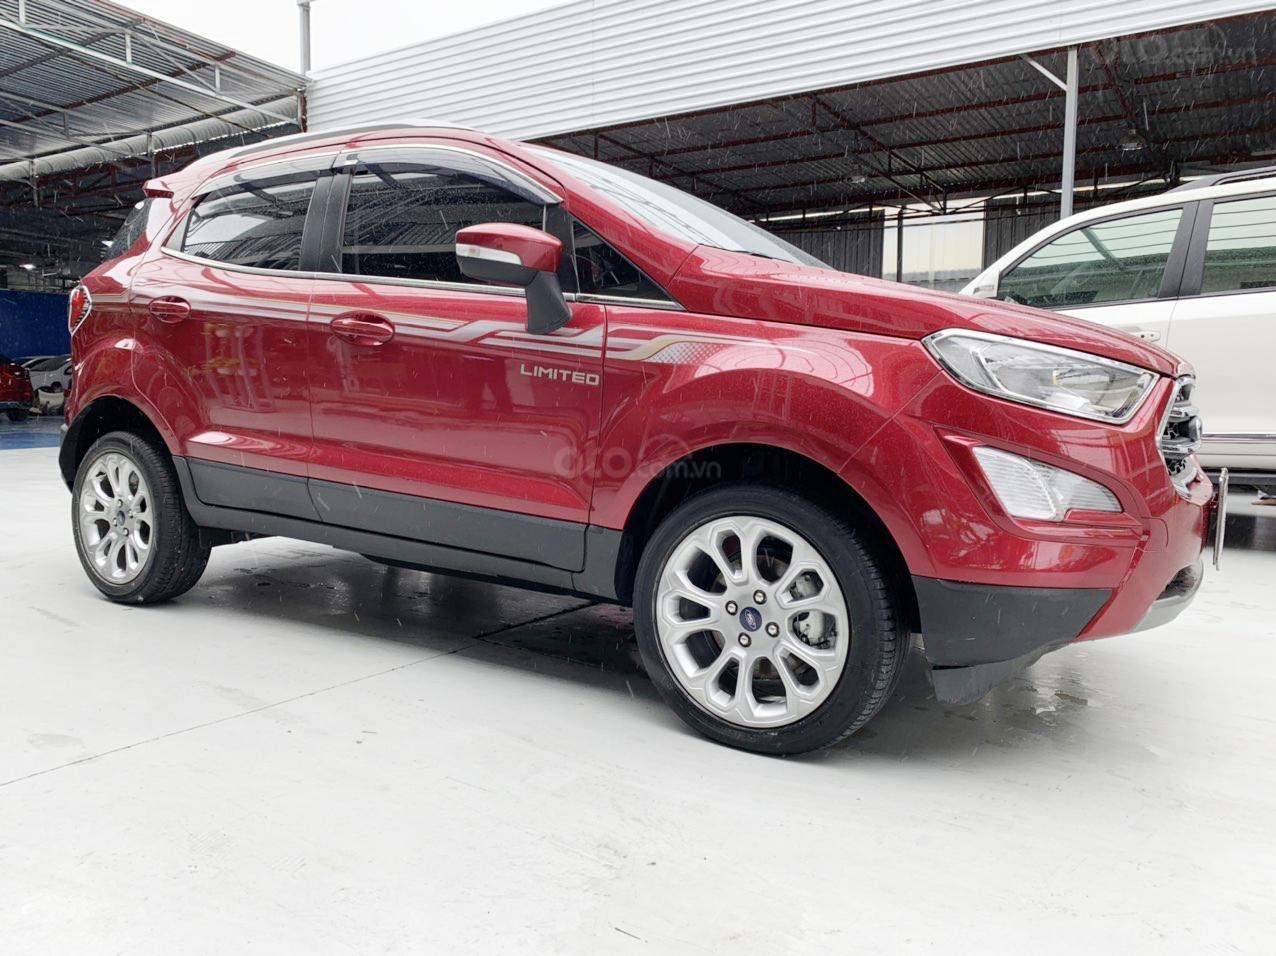 Cần bán Ford Ecosport 1.5 Titanium, sản xuất 2019 (1)